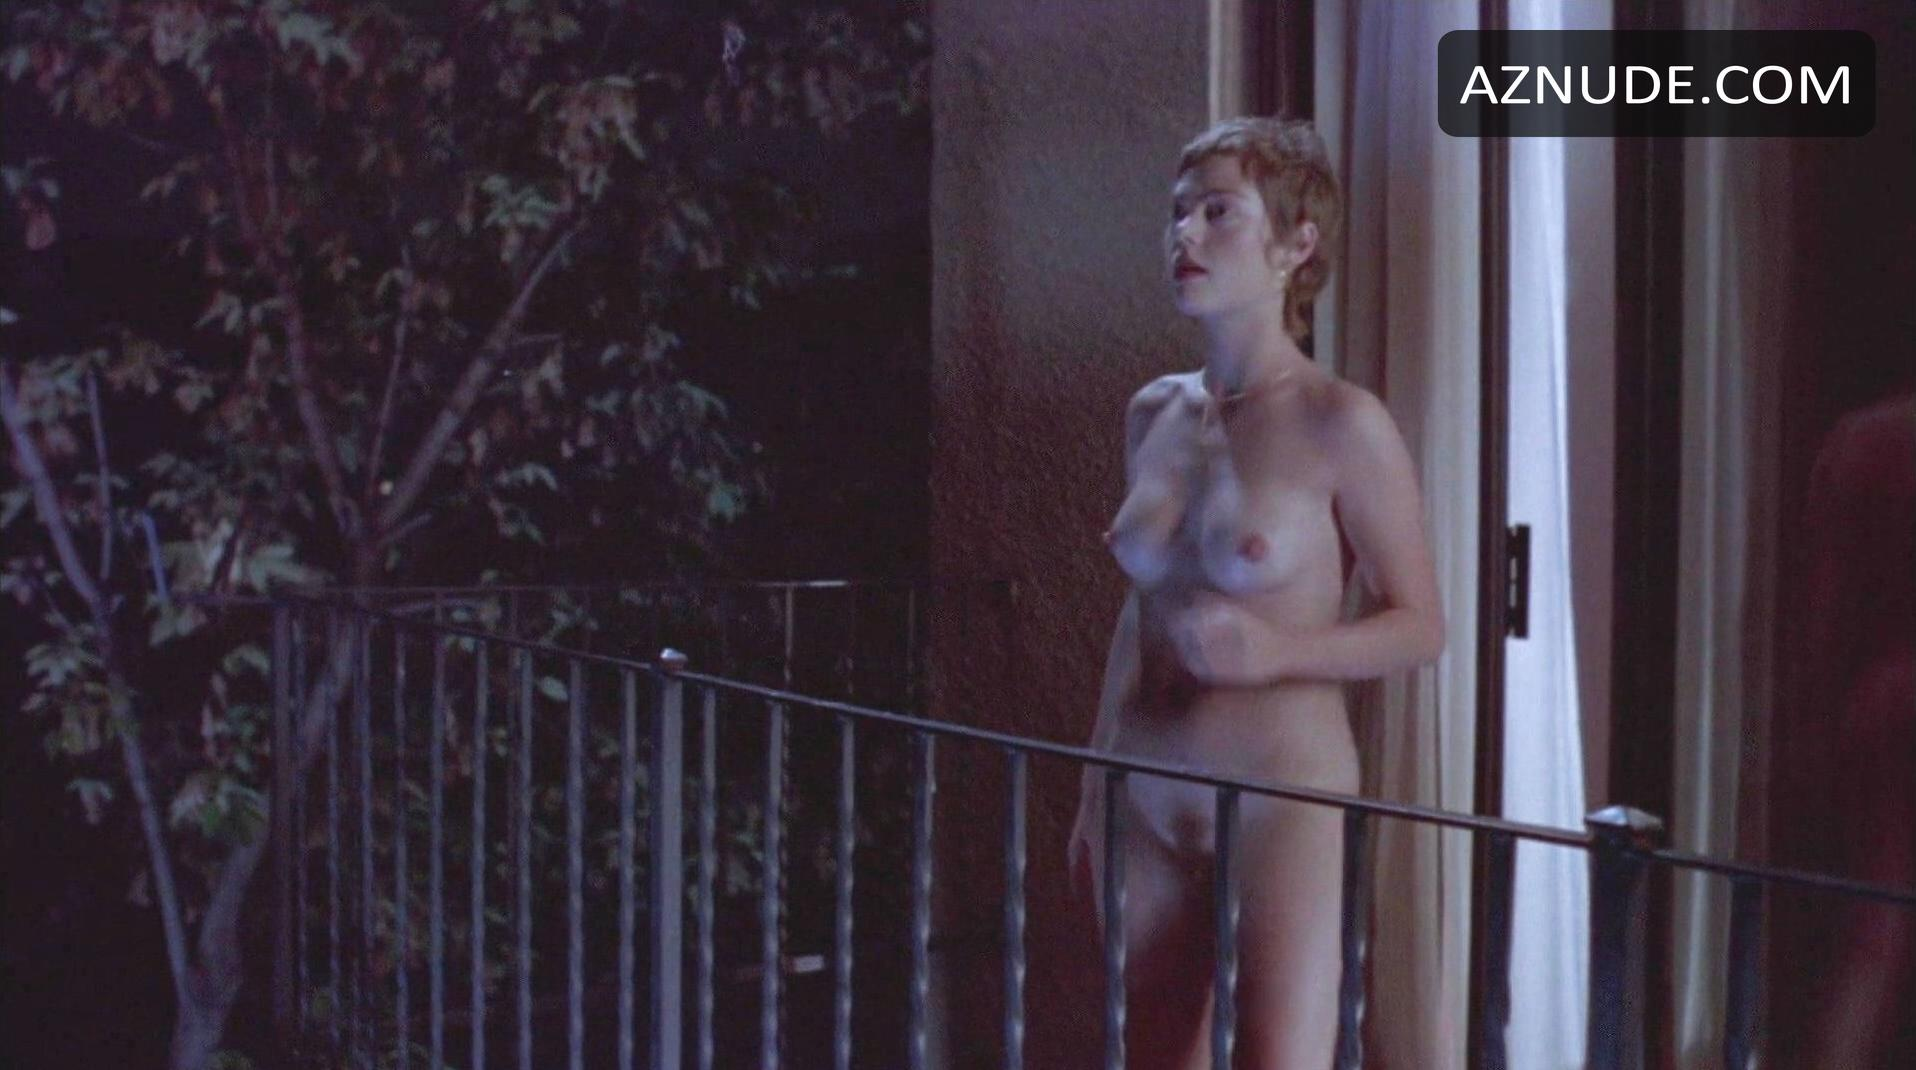 CAMILLA RUTHERFORD Nude - AZNude